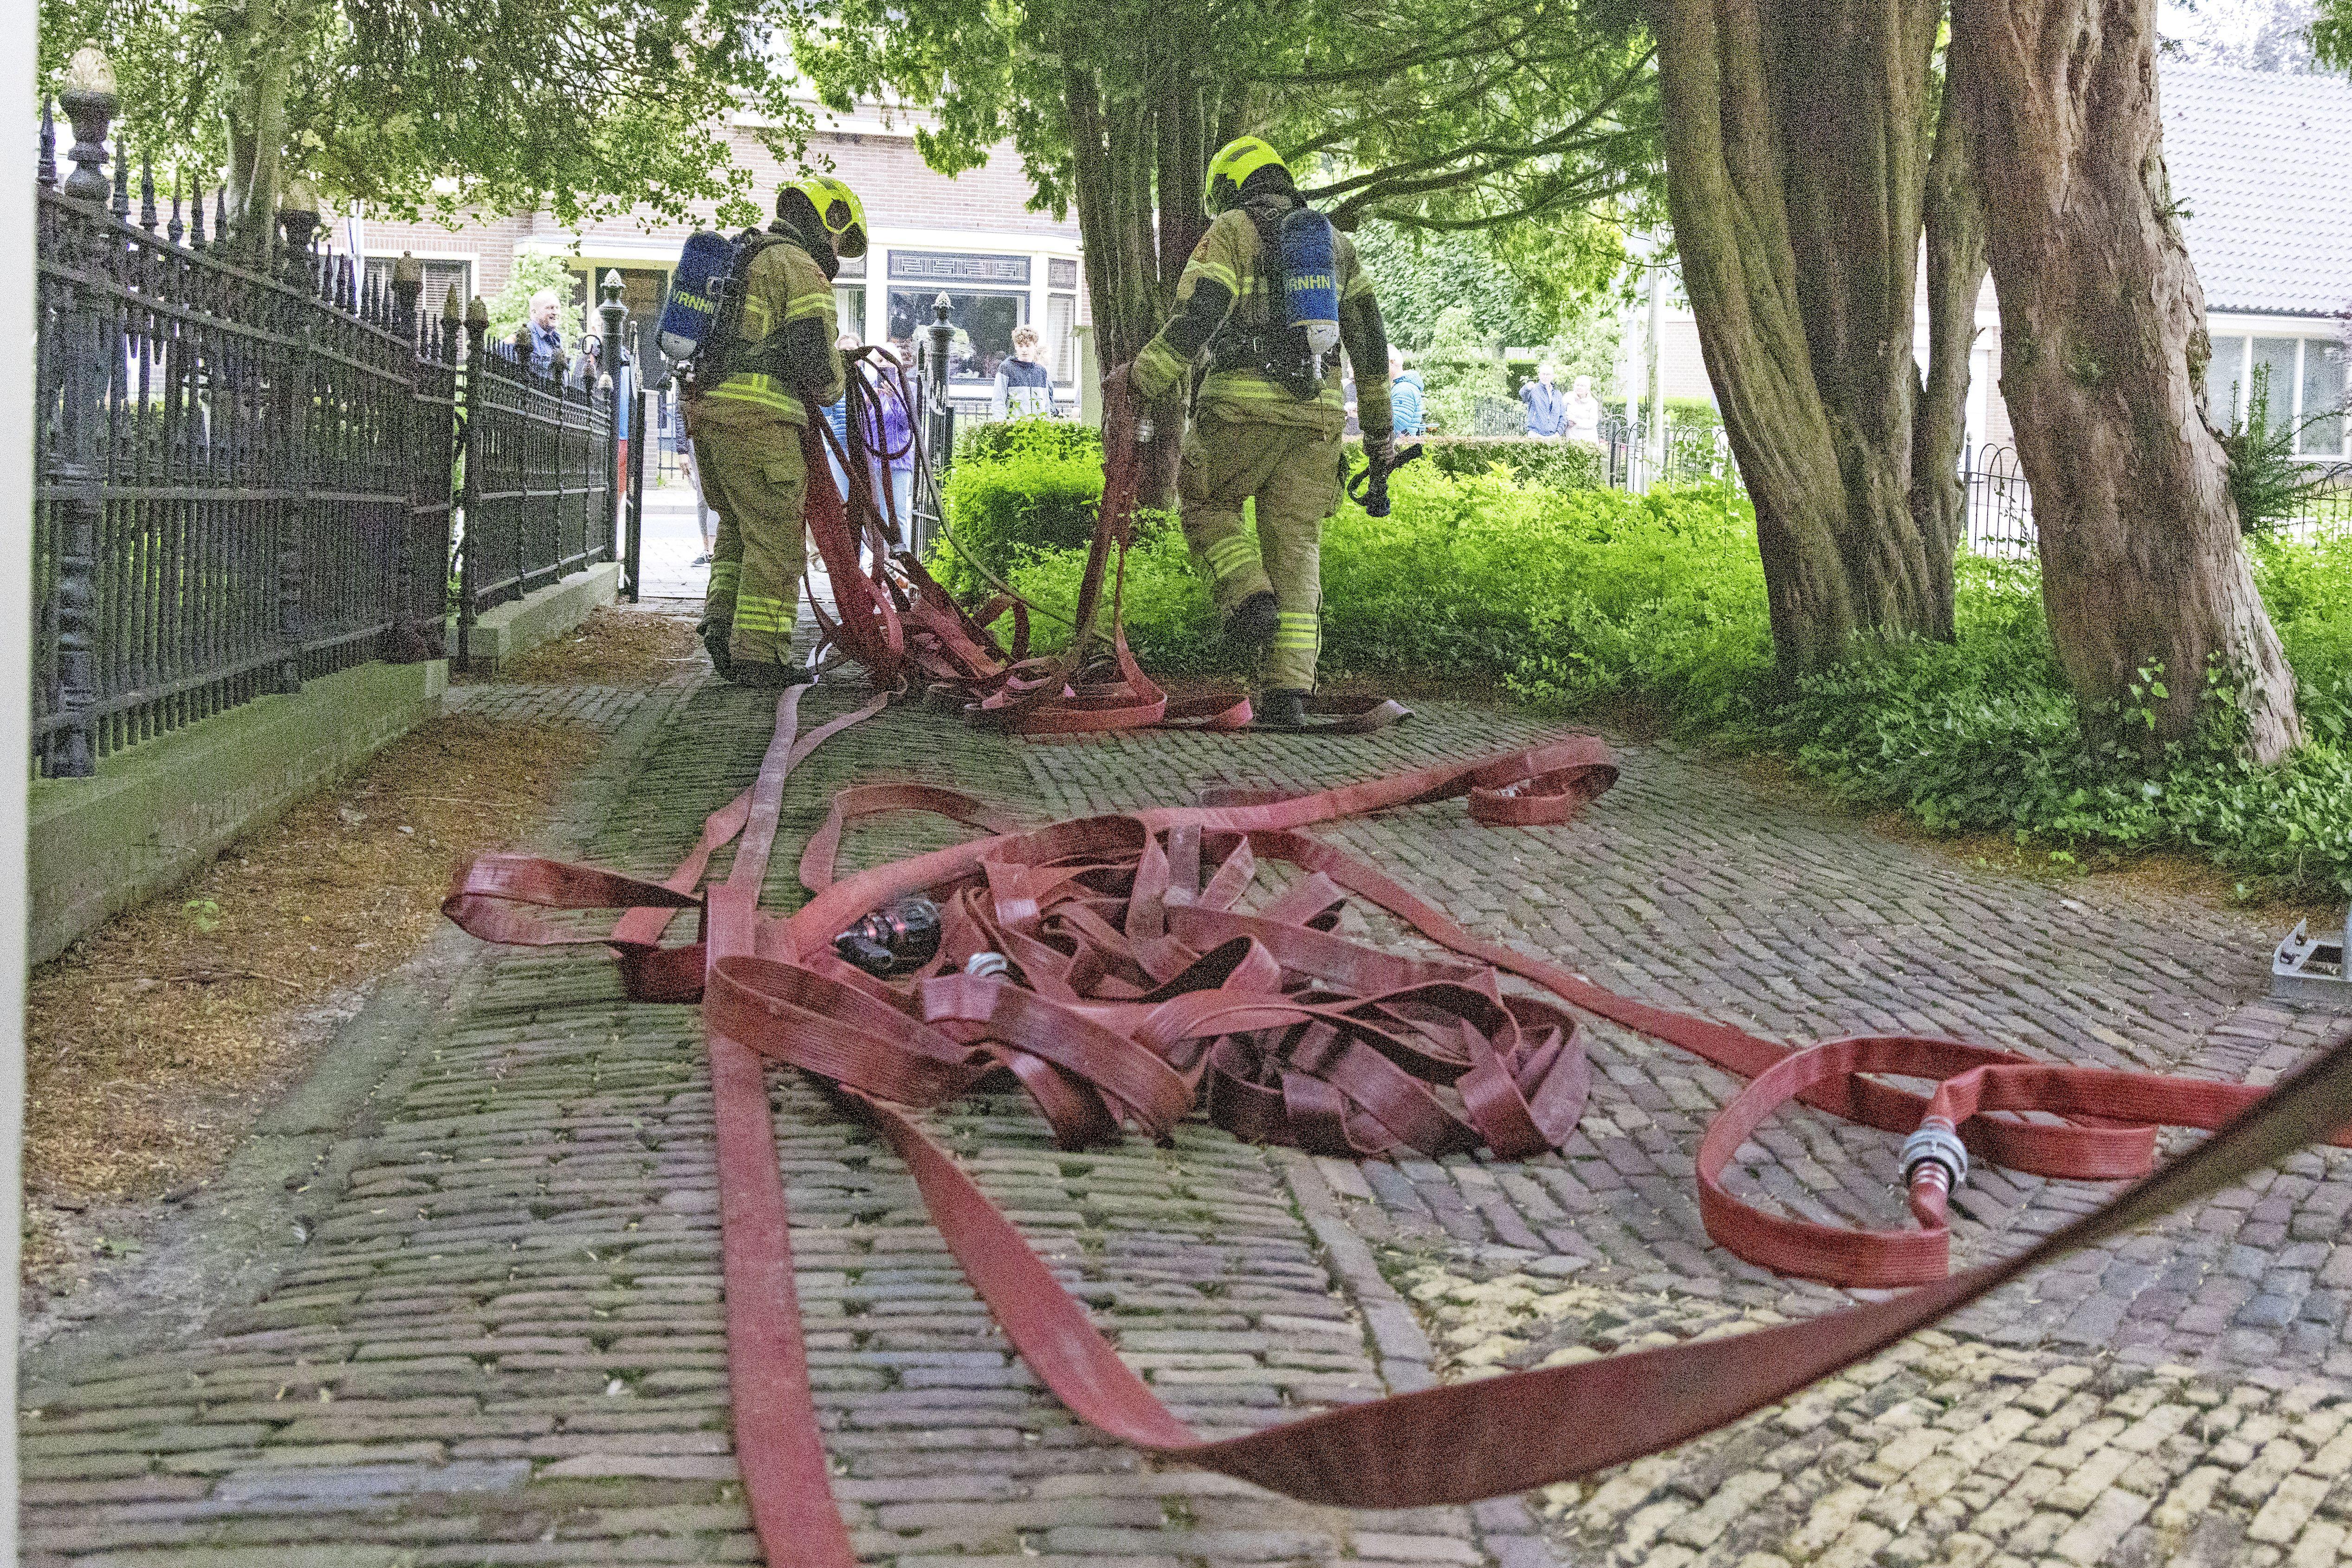 Blusgigant van Korps Marinebrandweer helpt bij brandweeroefening in Blokker [video]